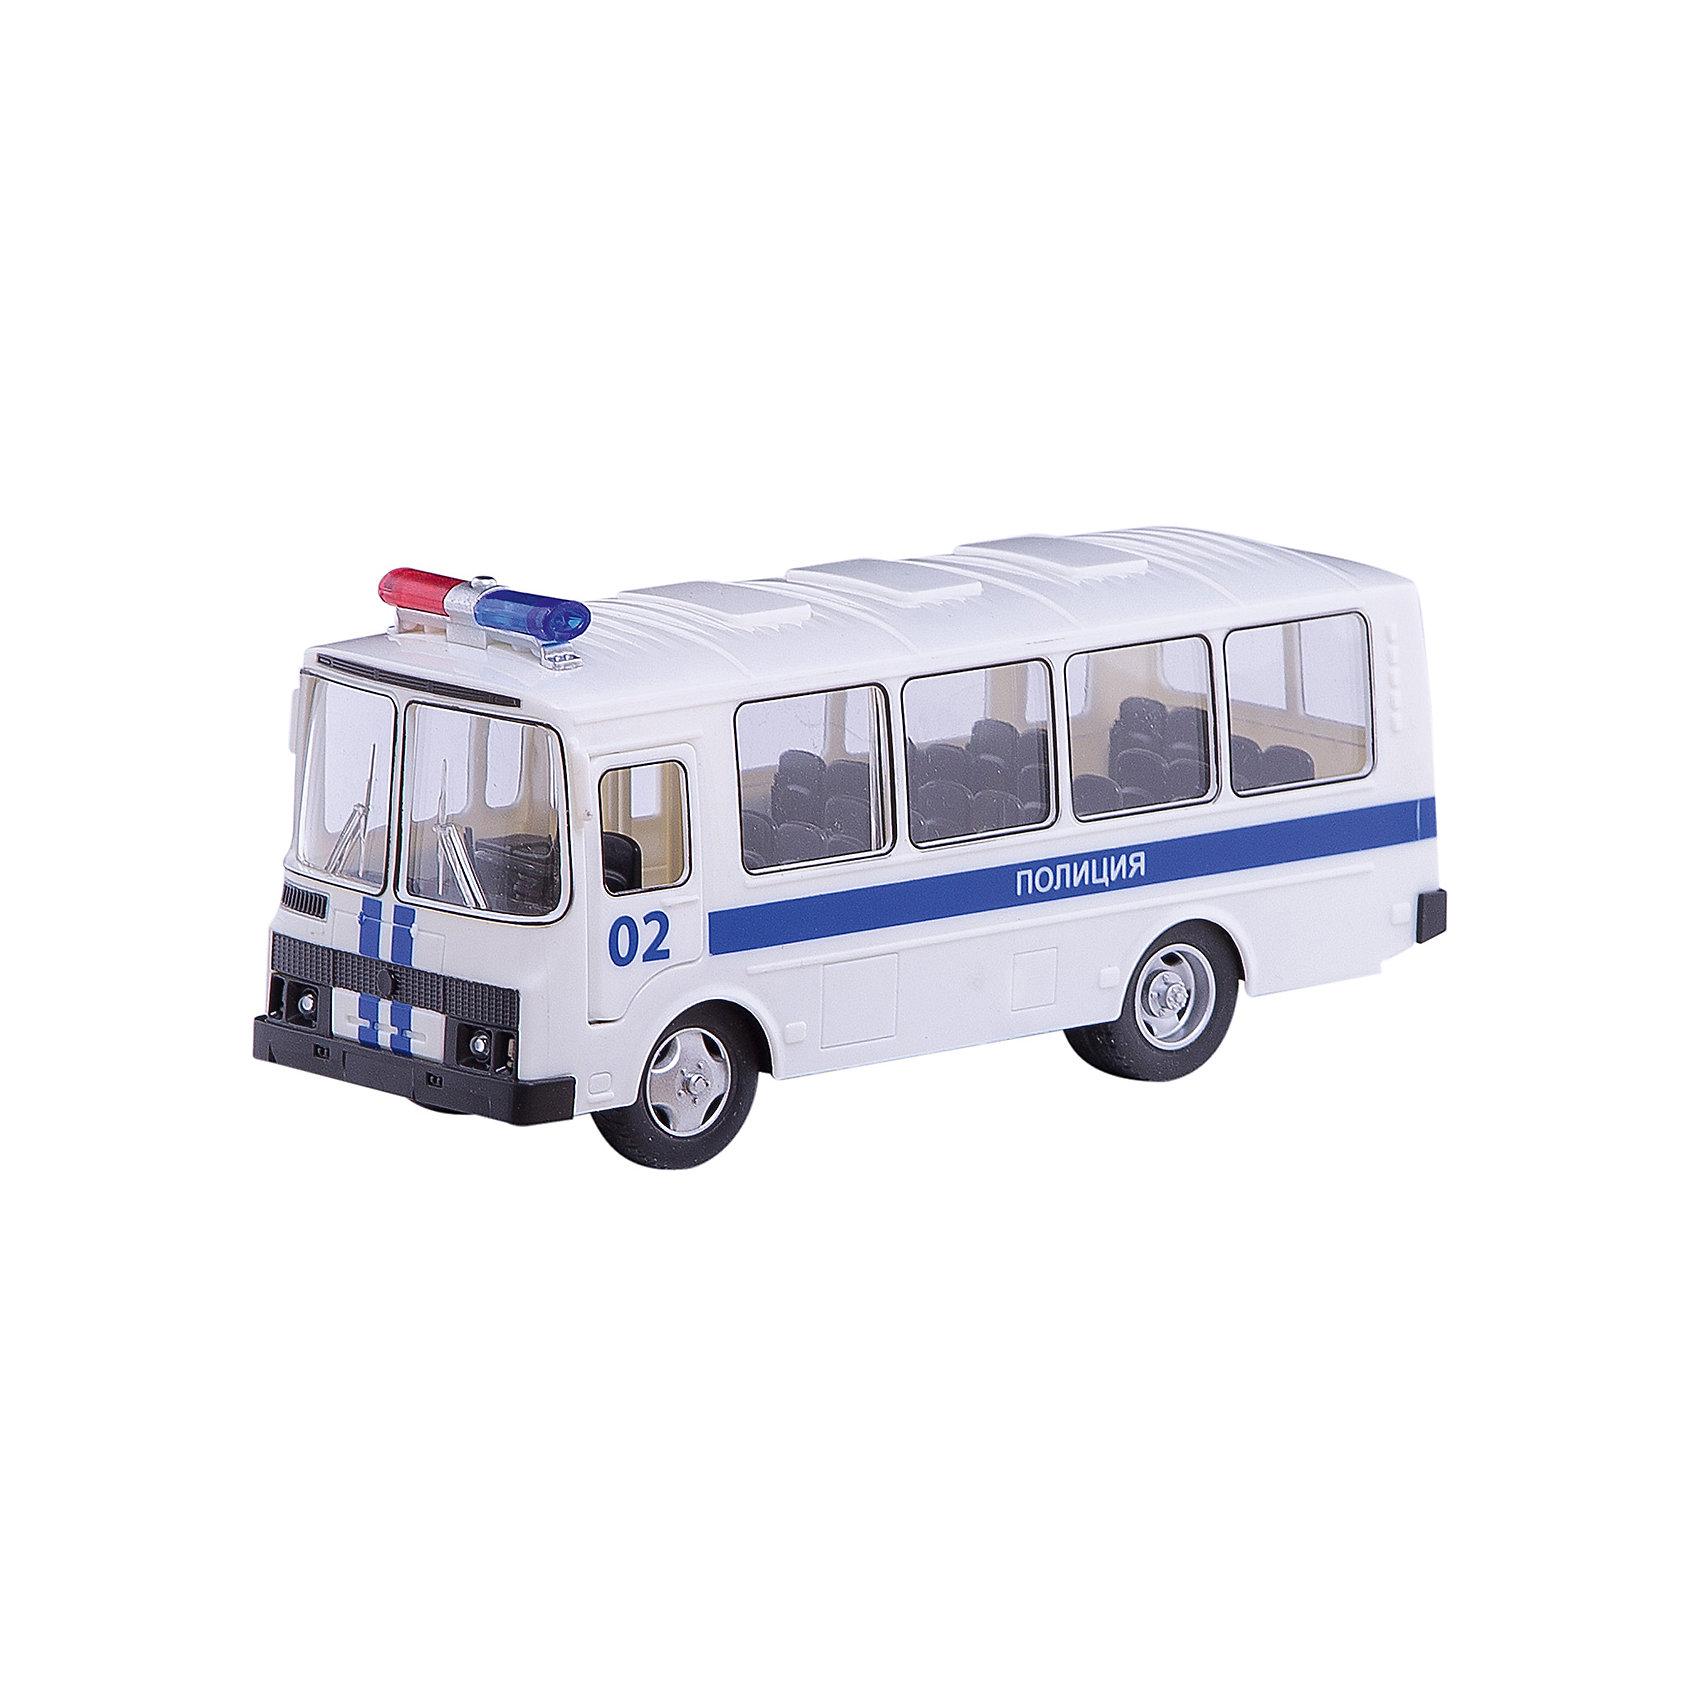 ТЕХНОПАРК Автобус, Технопарк авианосец инерционный технопарк